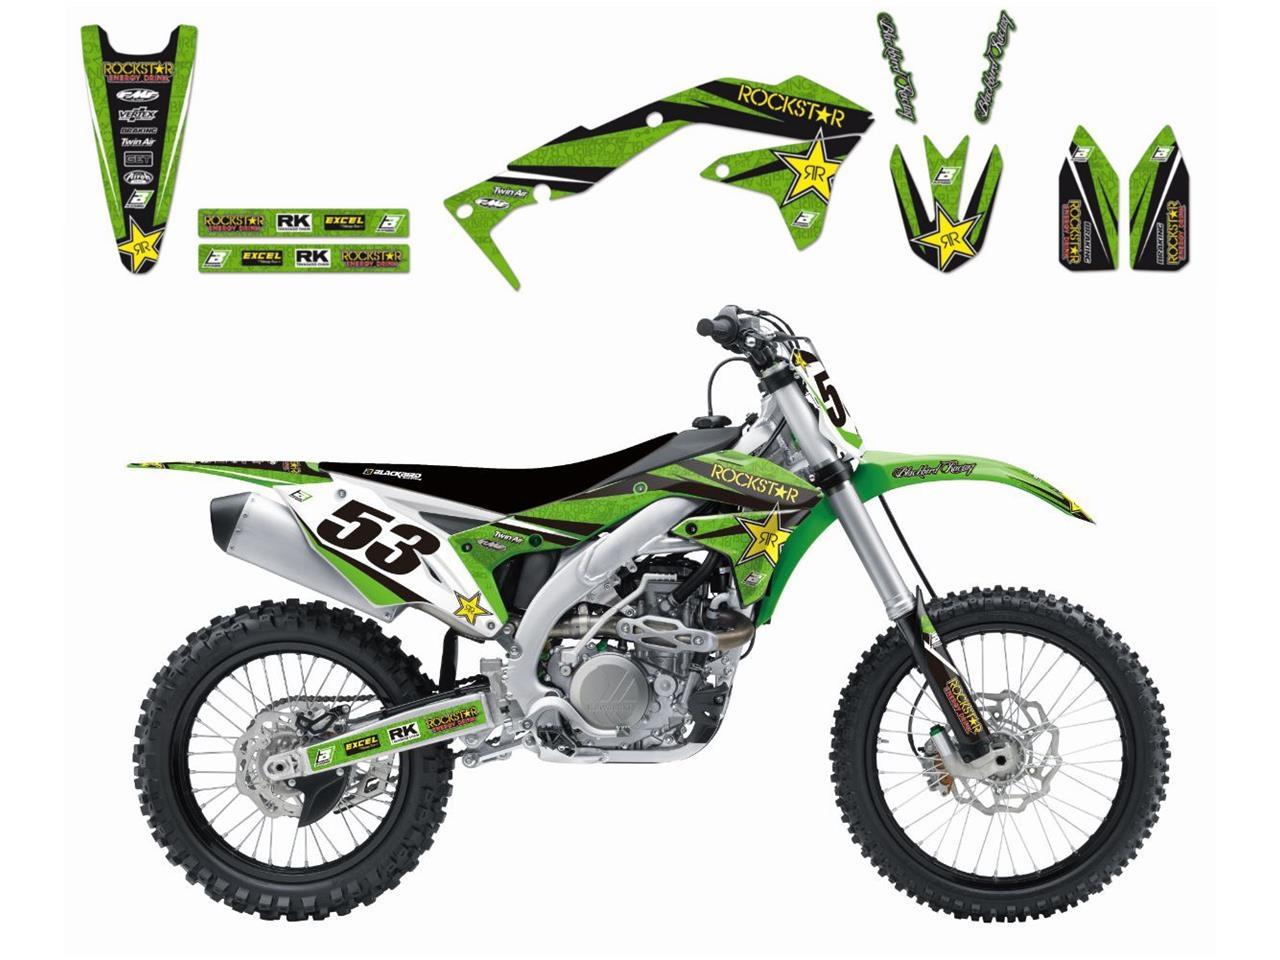 Kit déco Blackbird Rockstar Energy Kawasaki 250 KX-F 13-16 vert